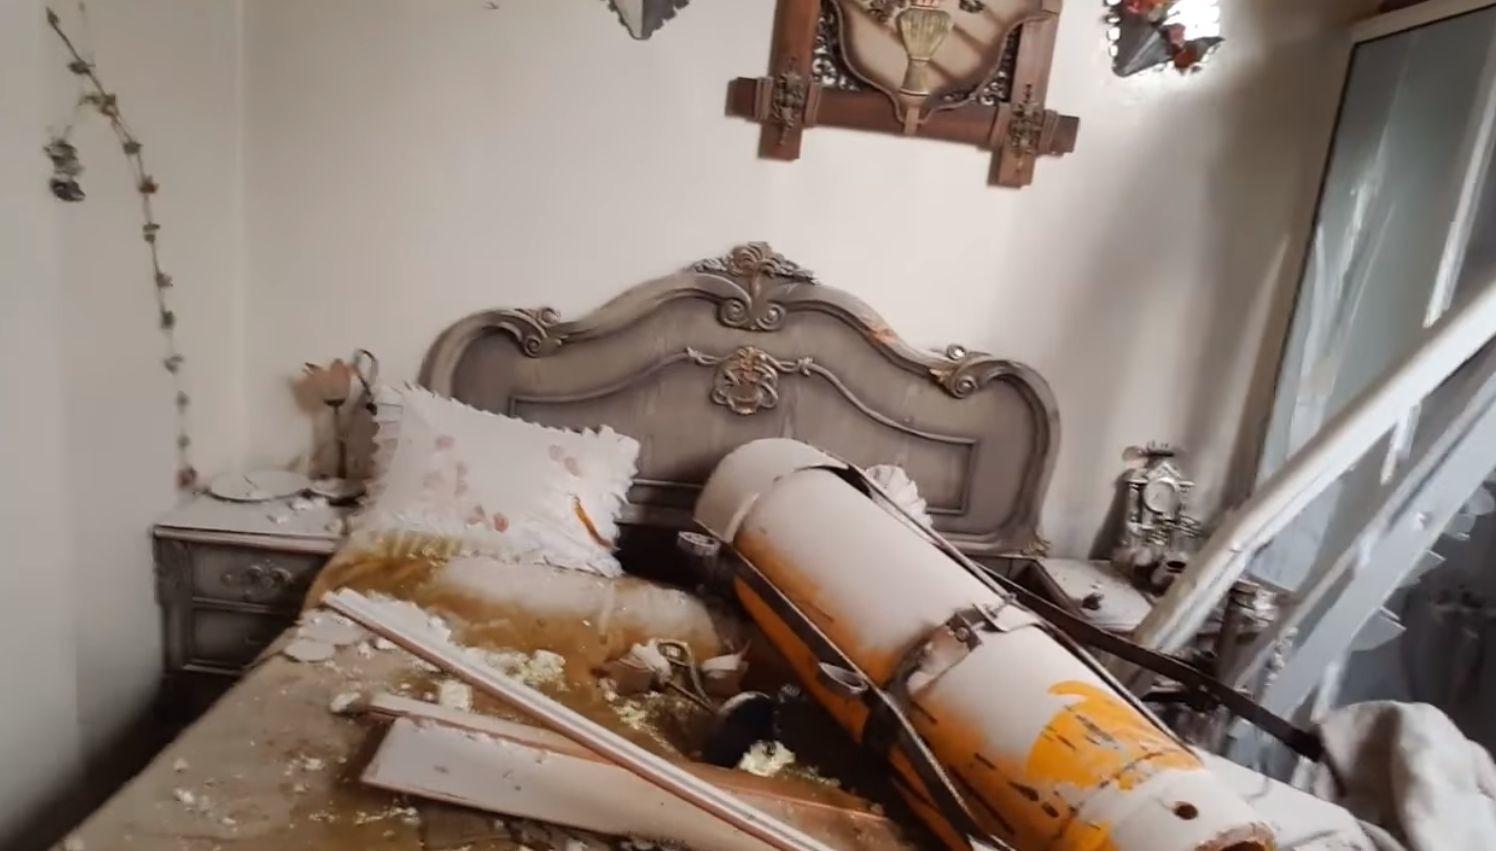 giftgasangriff-was-ist-in-duma-am-7.-april-2018-passiert